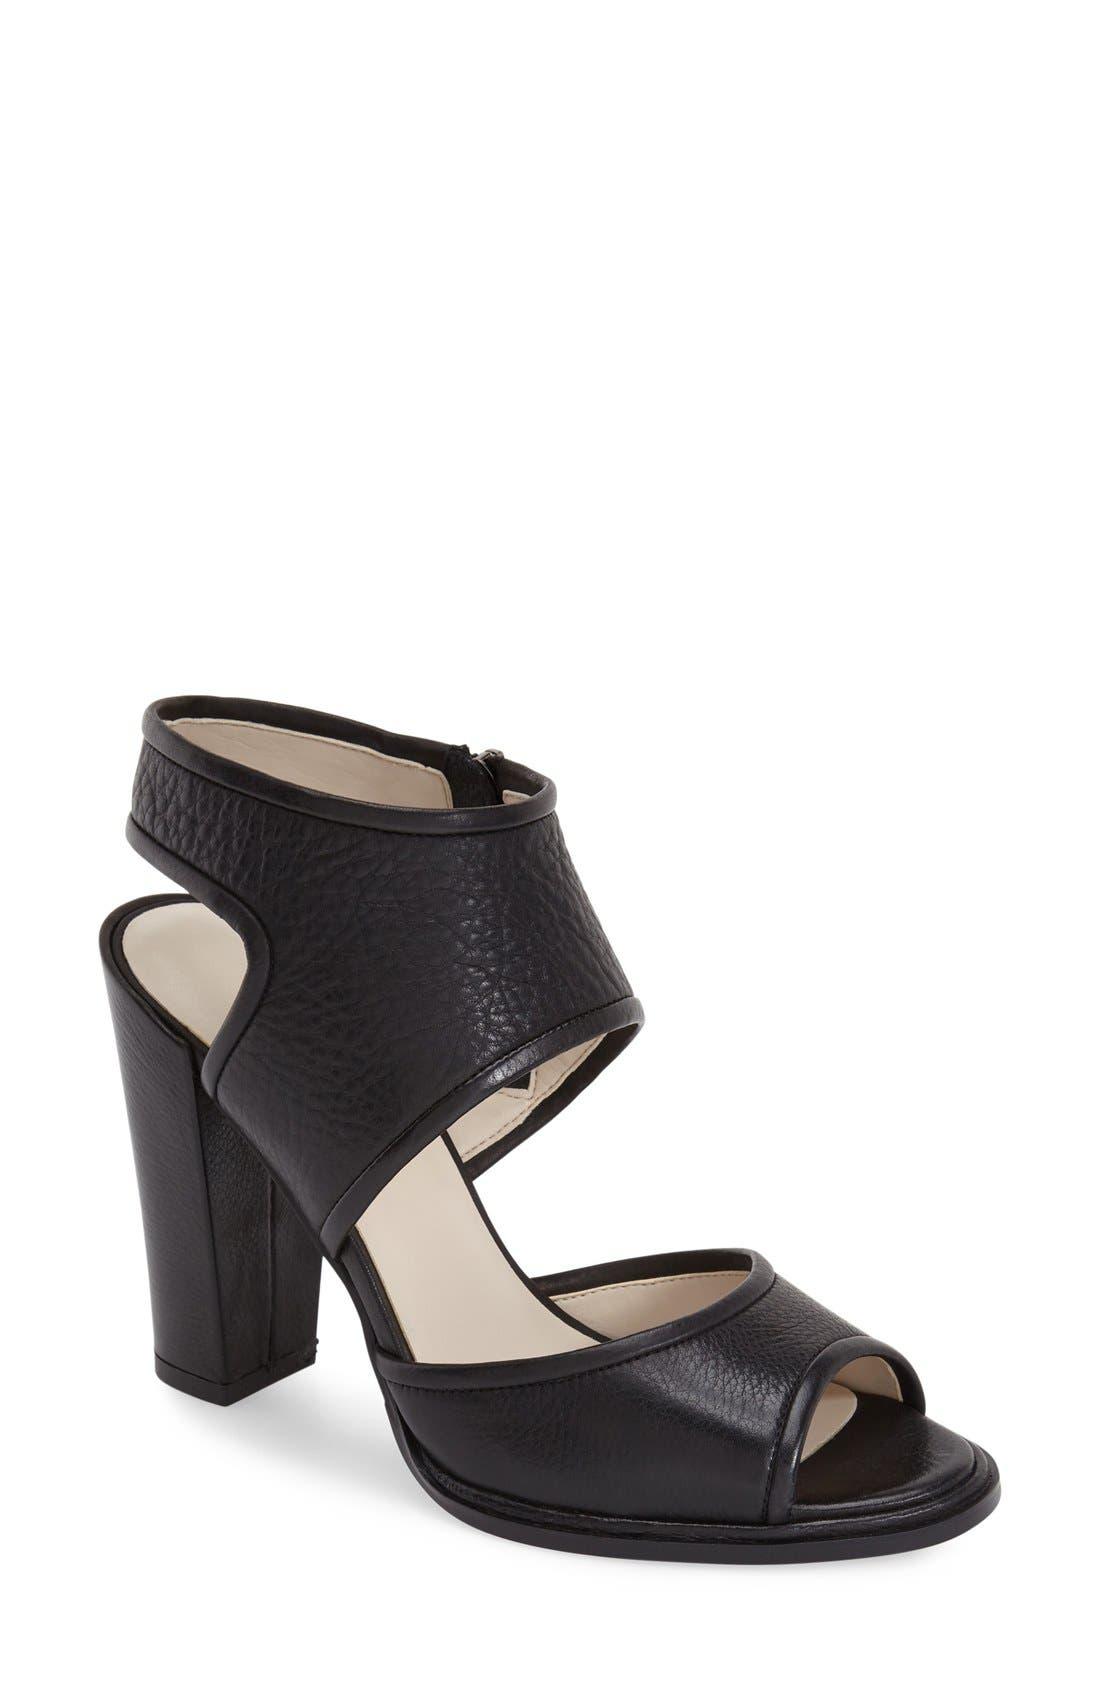 'Stacy' Sandal,                         Main,                         color, 002